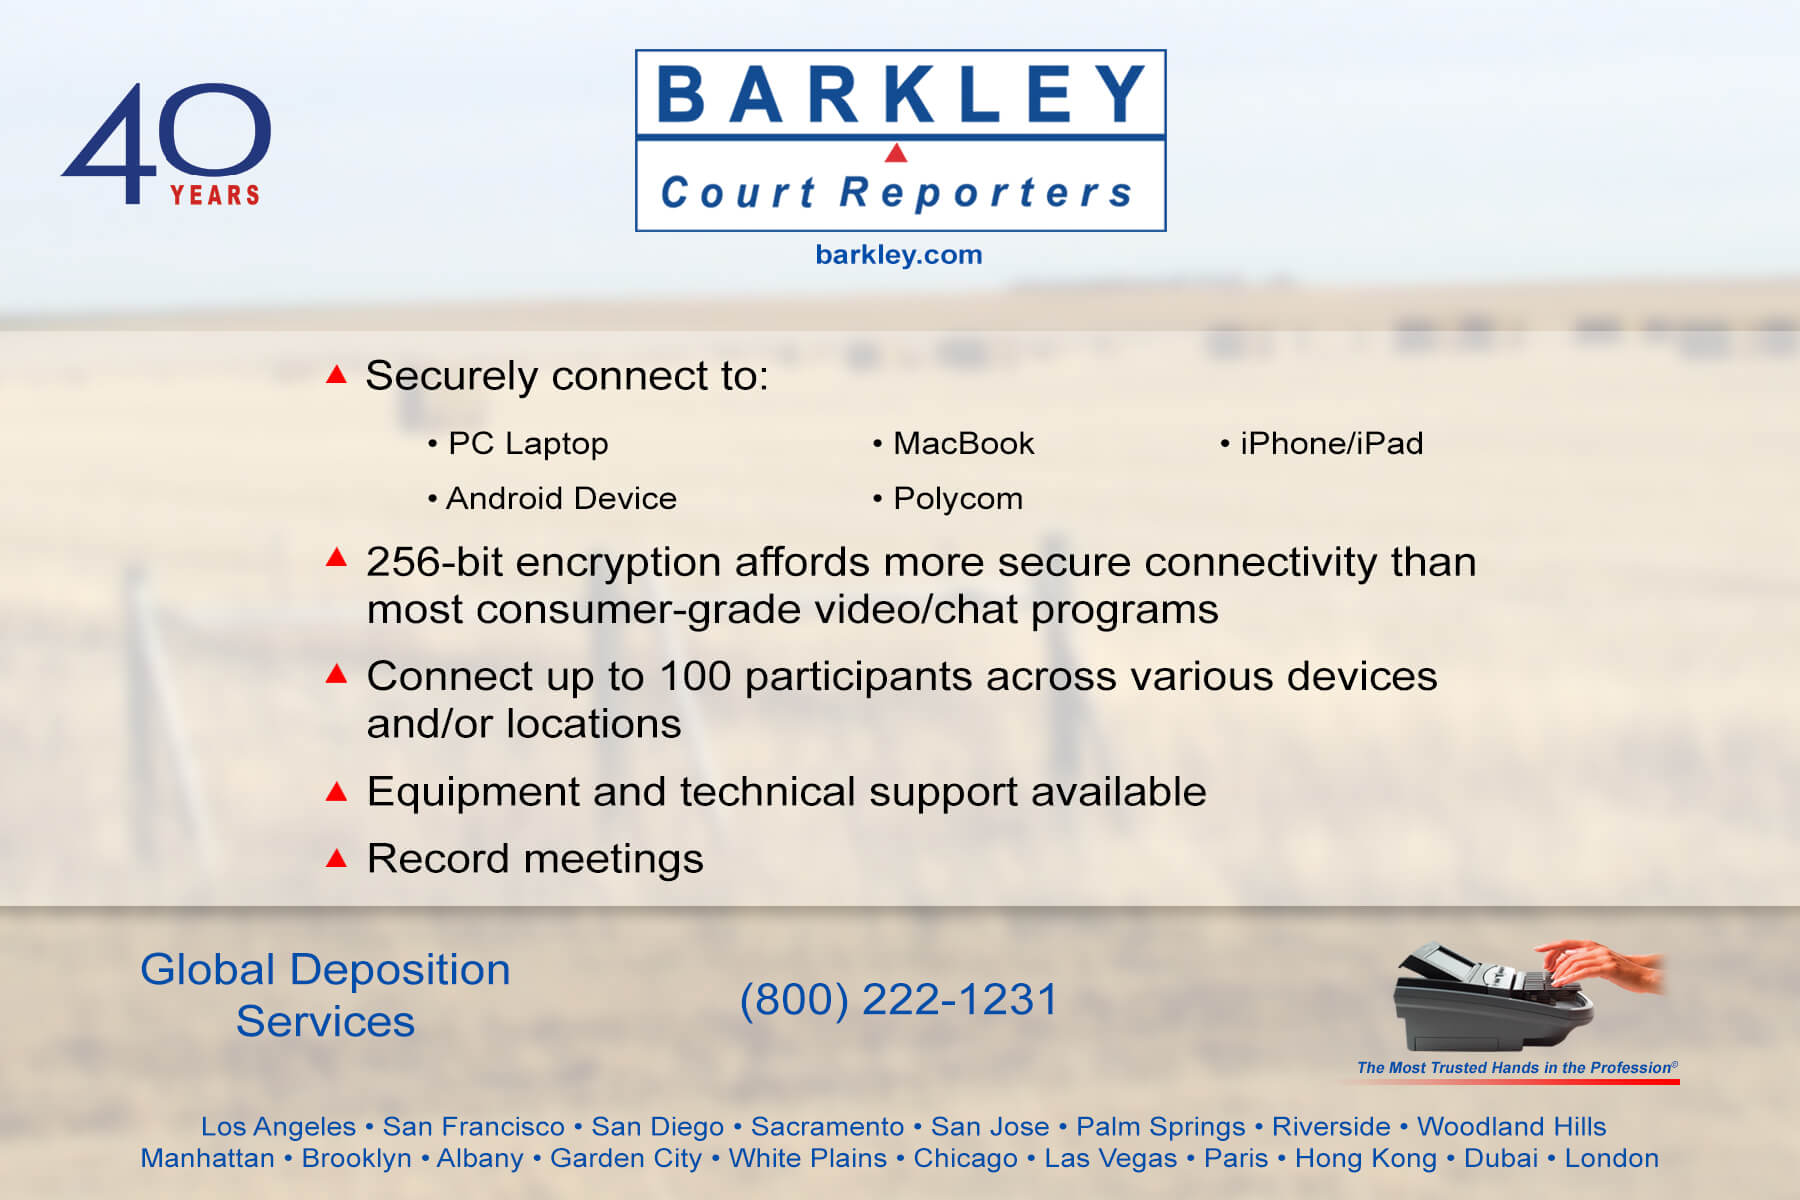 Barkley-Mobile_VC_Back_4x6_001 (002)